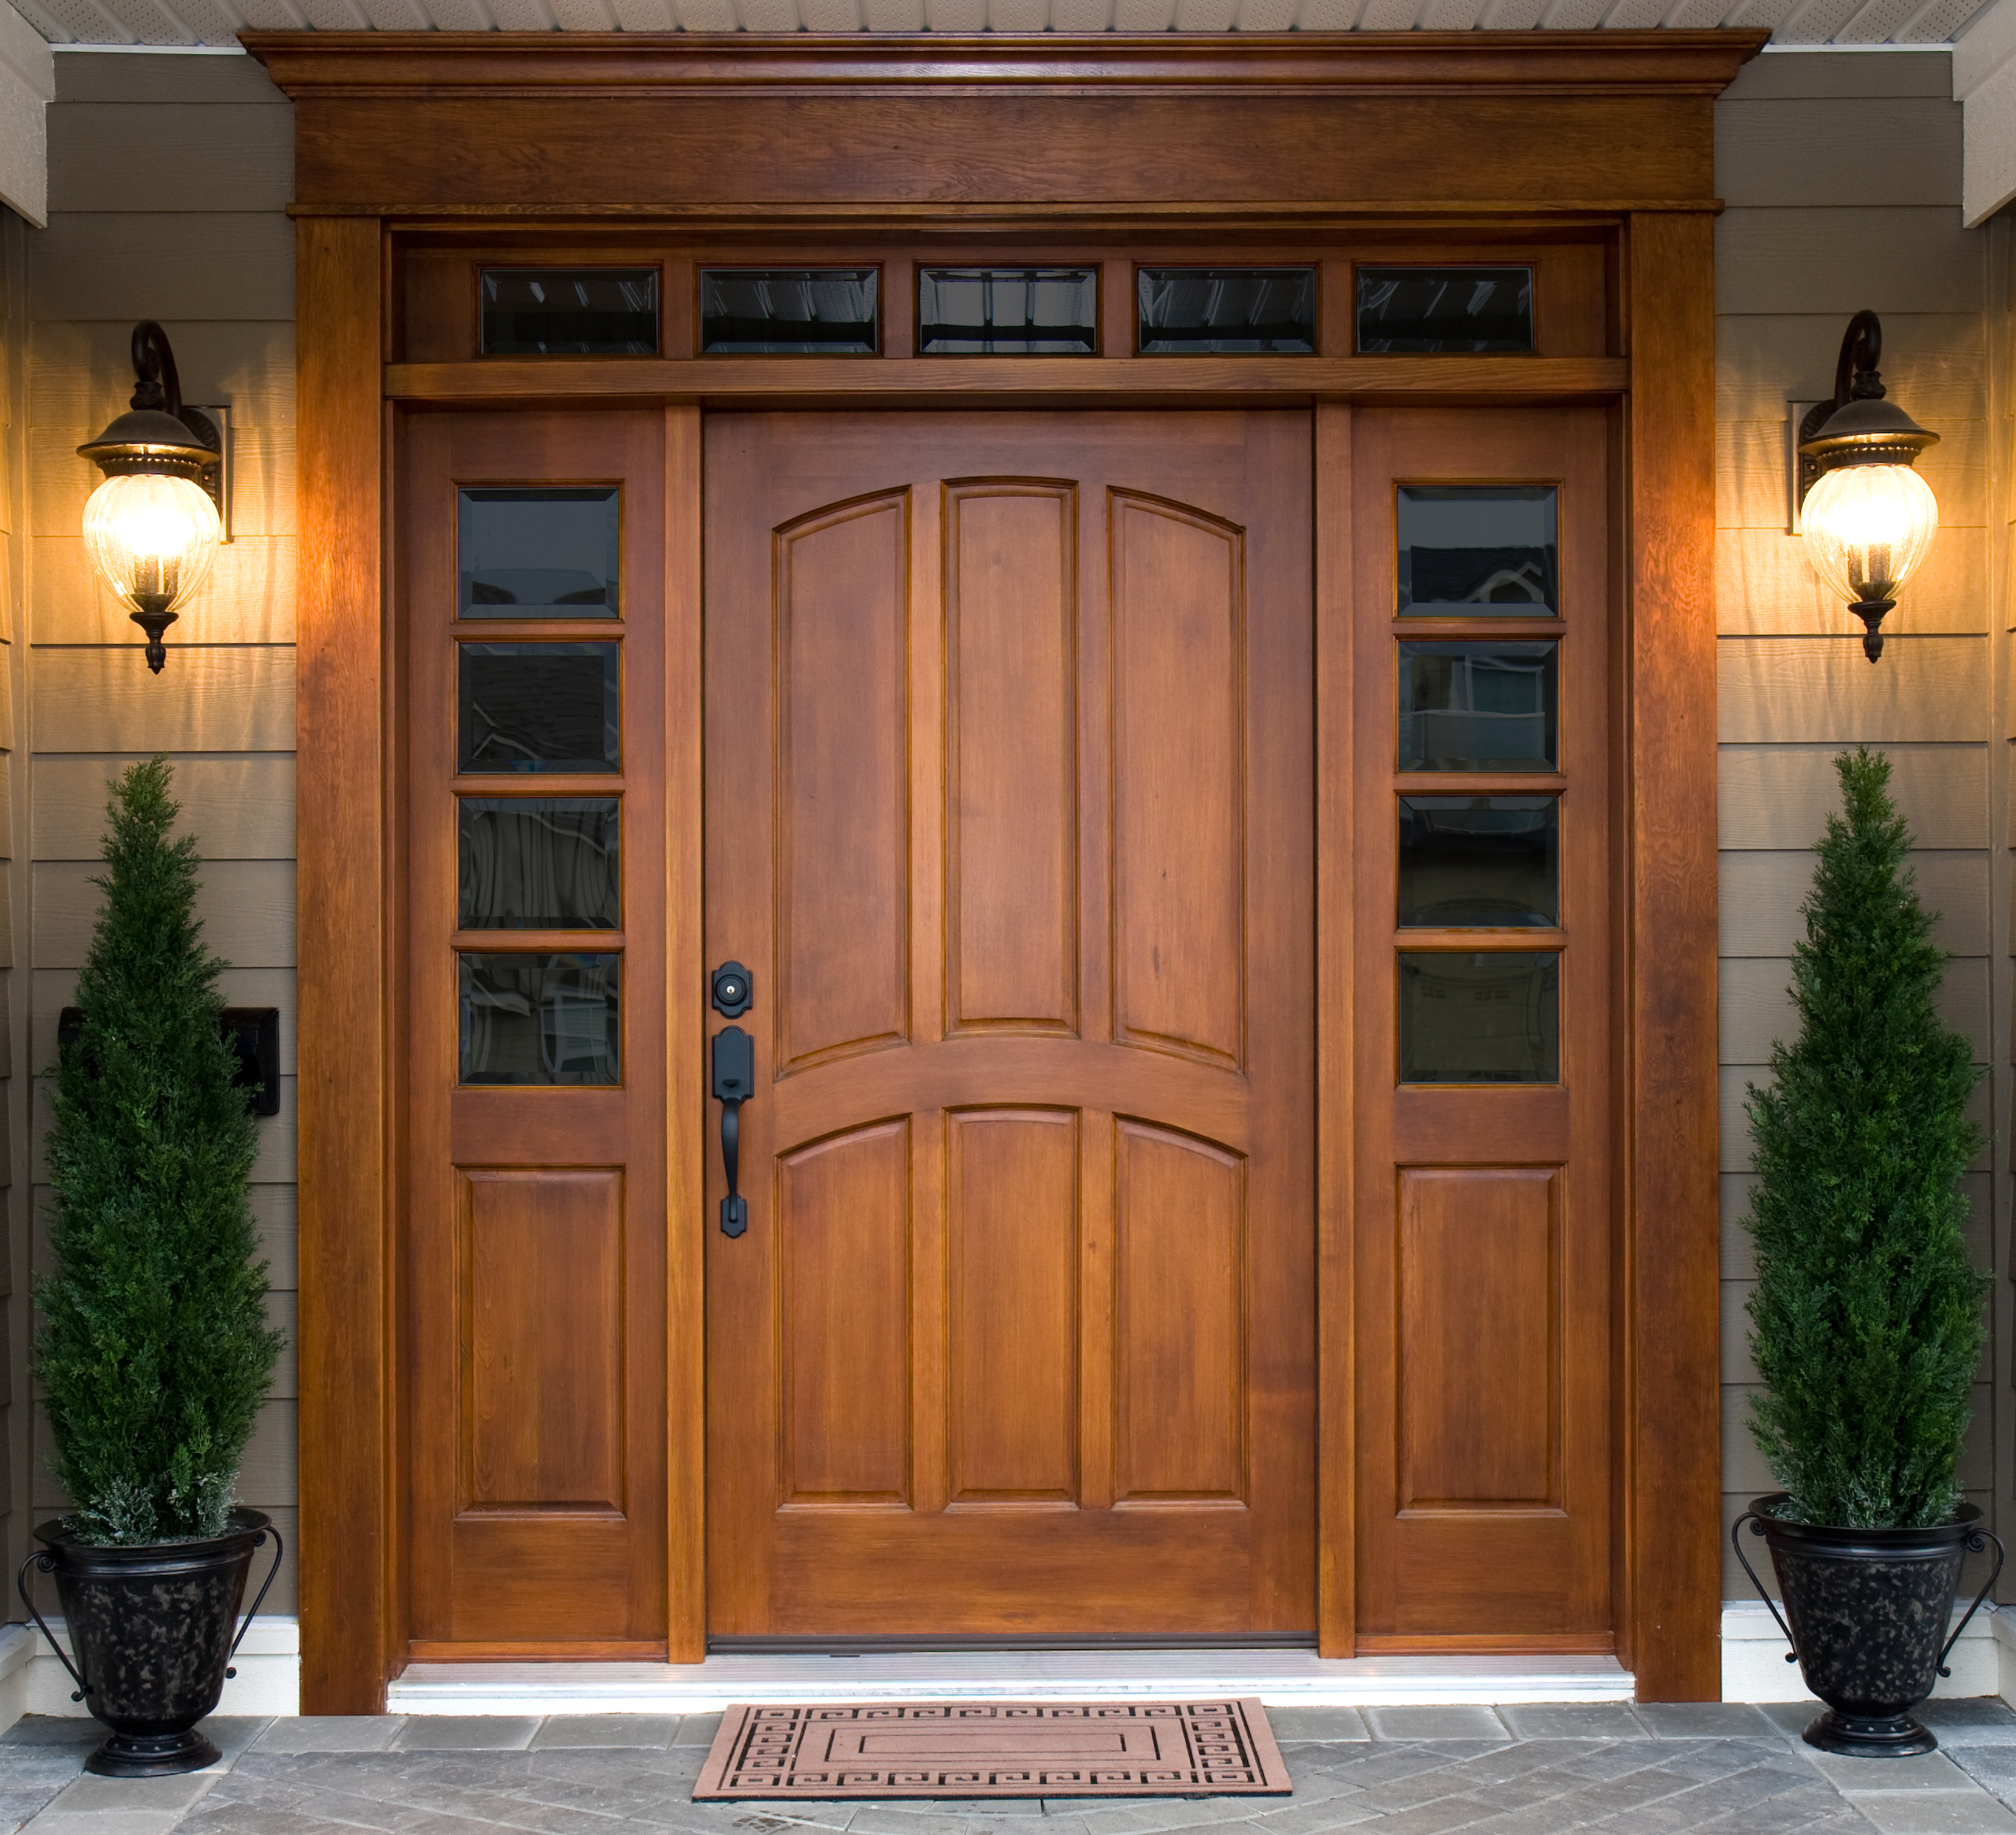 Beautiful wooden front door framed by windows